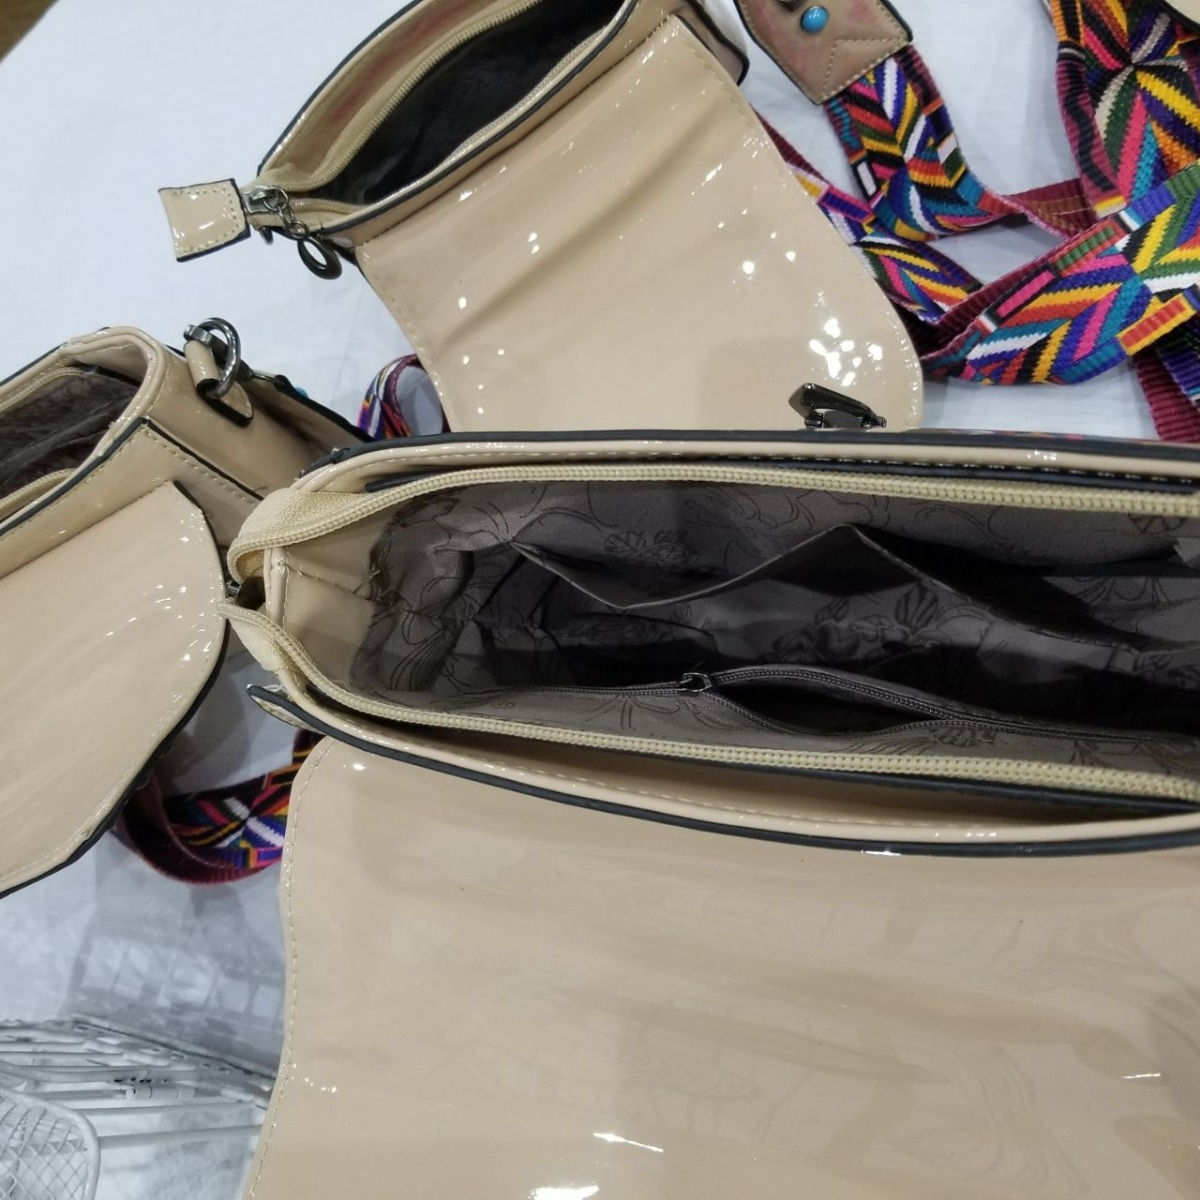 532c14b2b kit 3 bolsas inspired valentino alça colorida transversal. Carregando zoom.